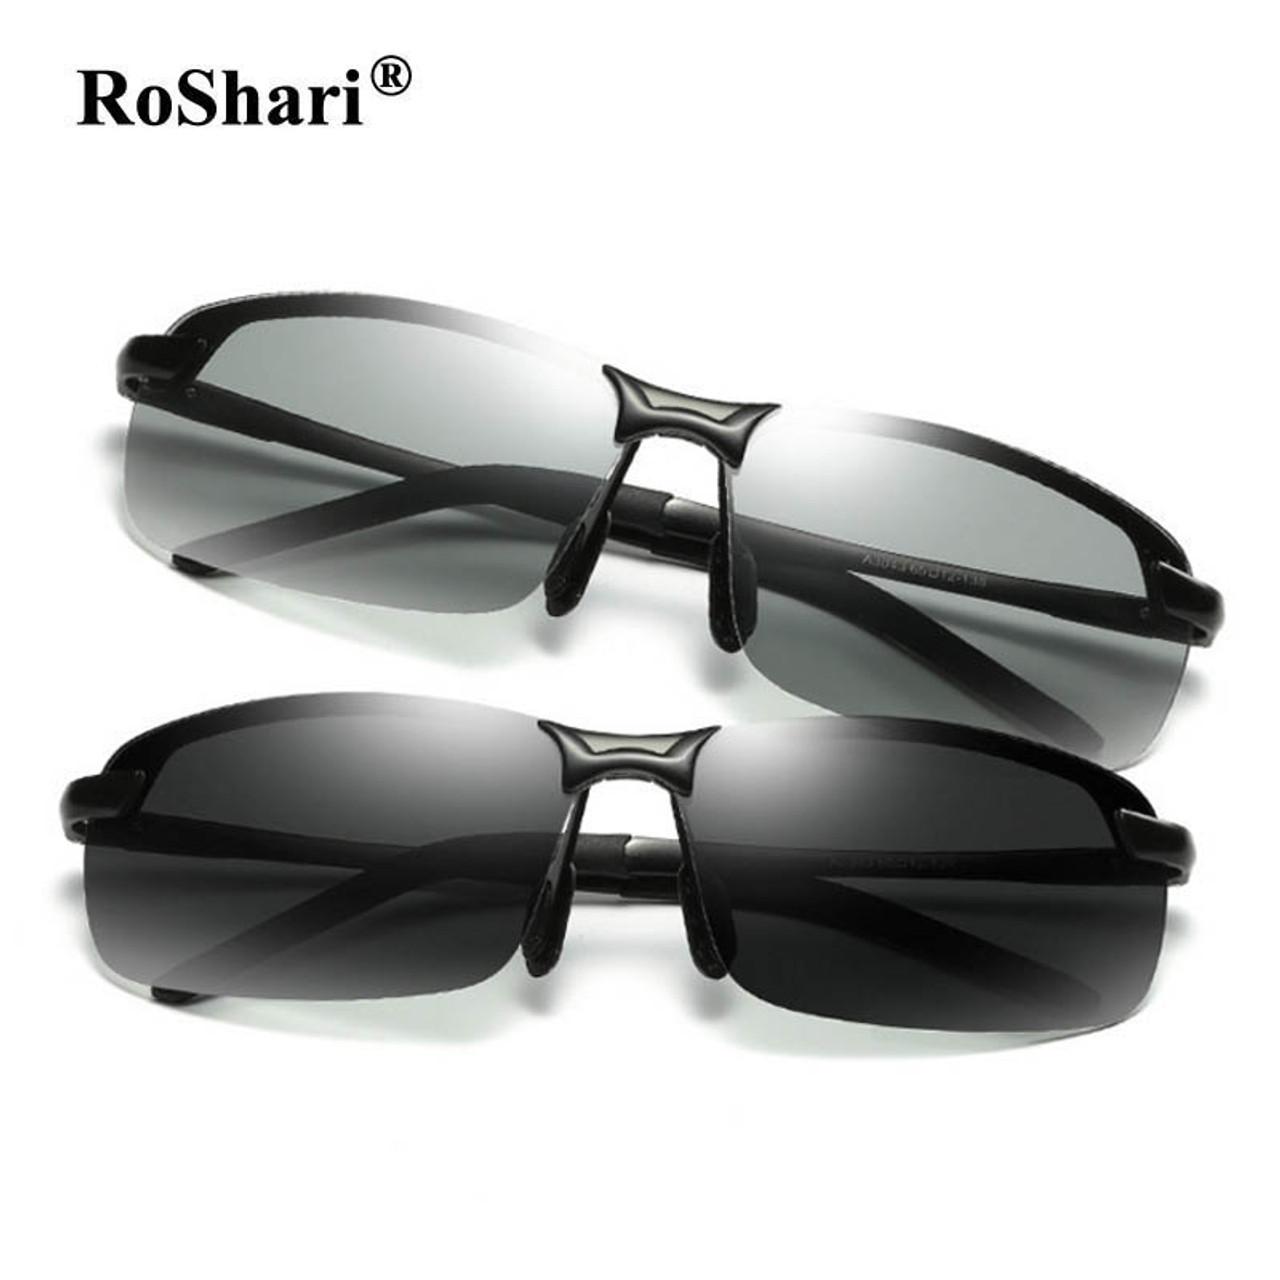 c9e02f3639b RoShari Driving Photochromic Sunglasses Men Polarized Chameleon  Discoloration Sun glasses for men ...